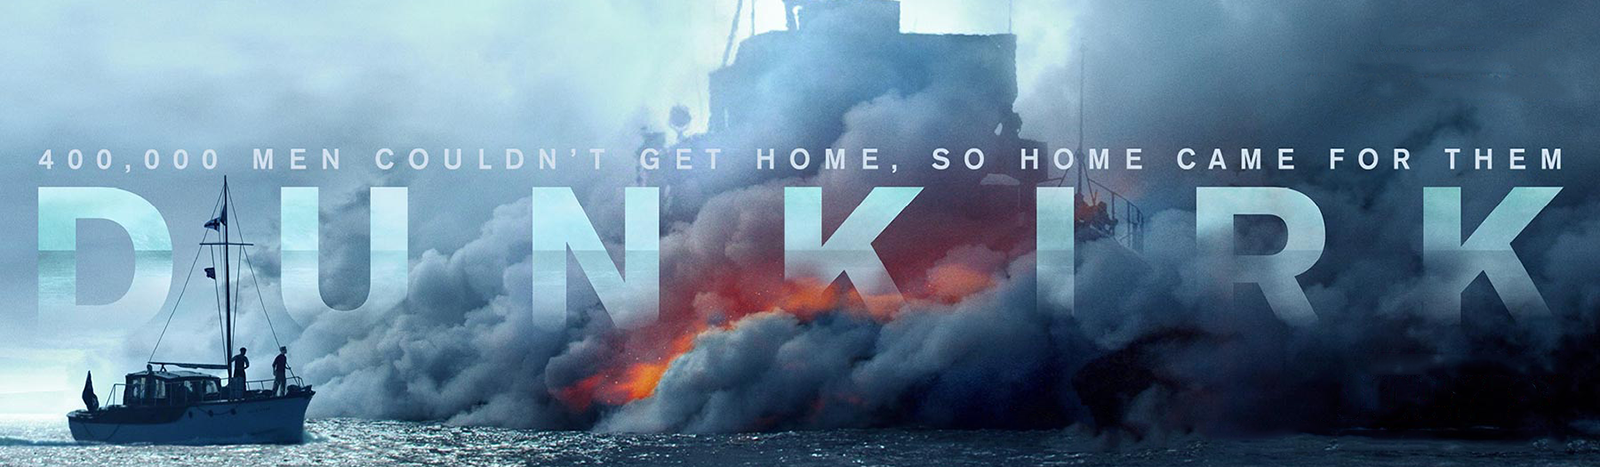 Dunkirk Christopher Nolan banner